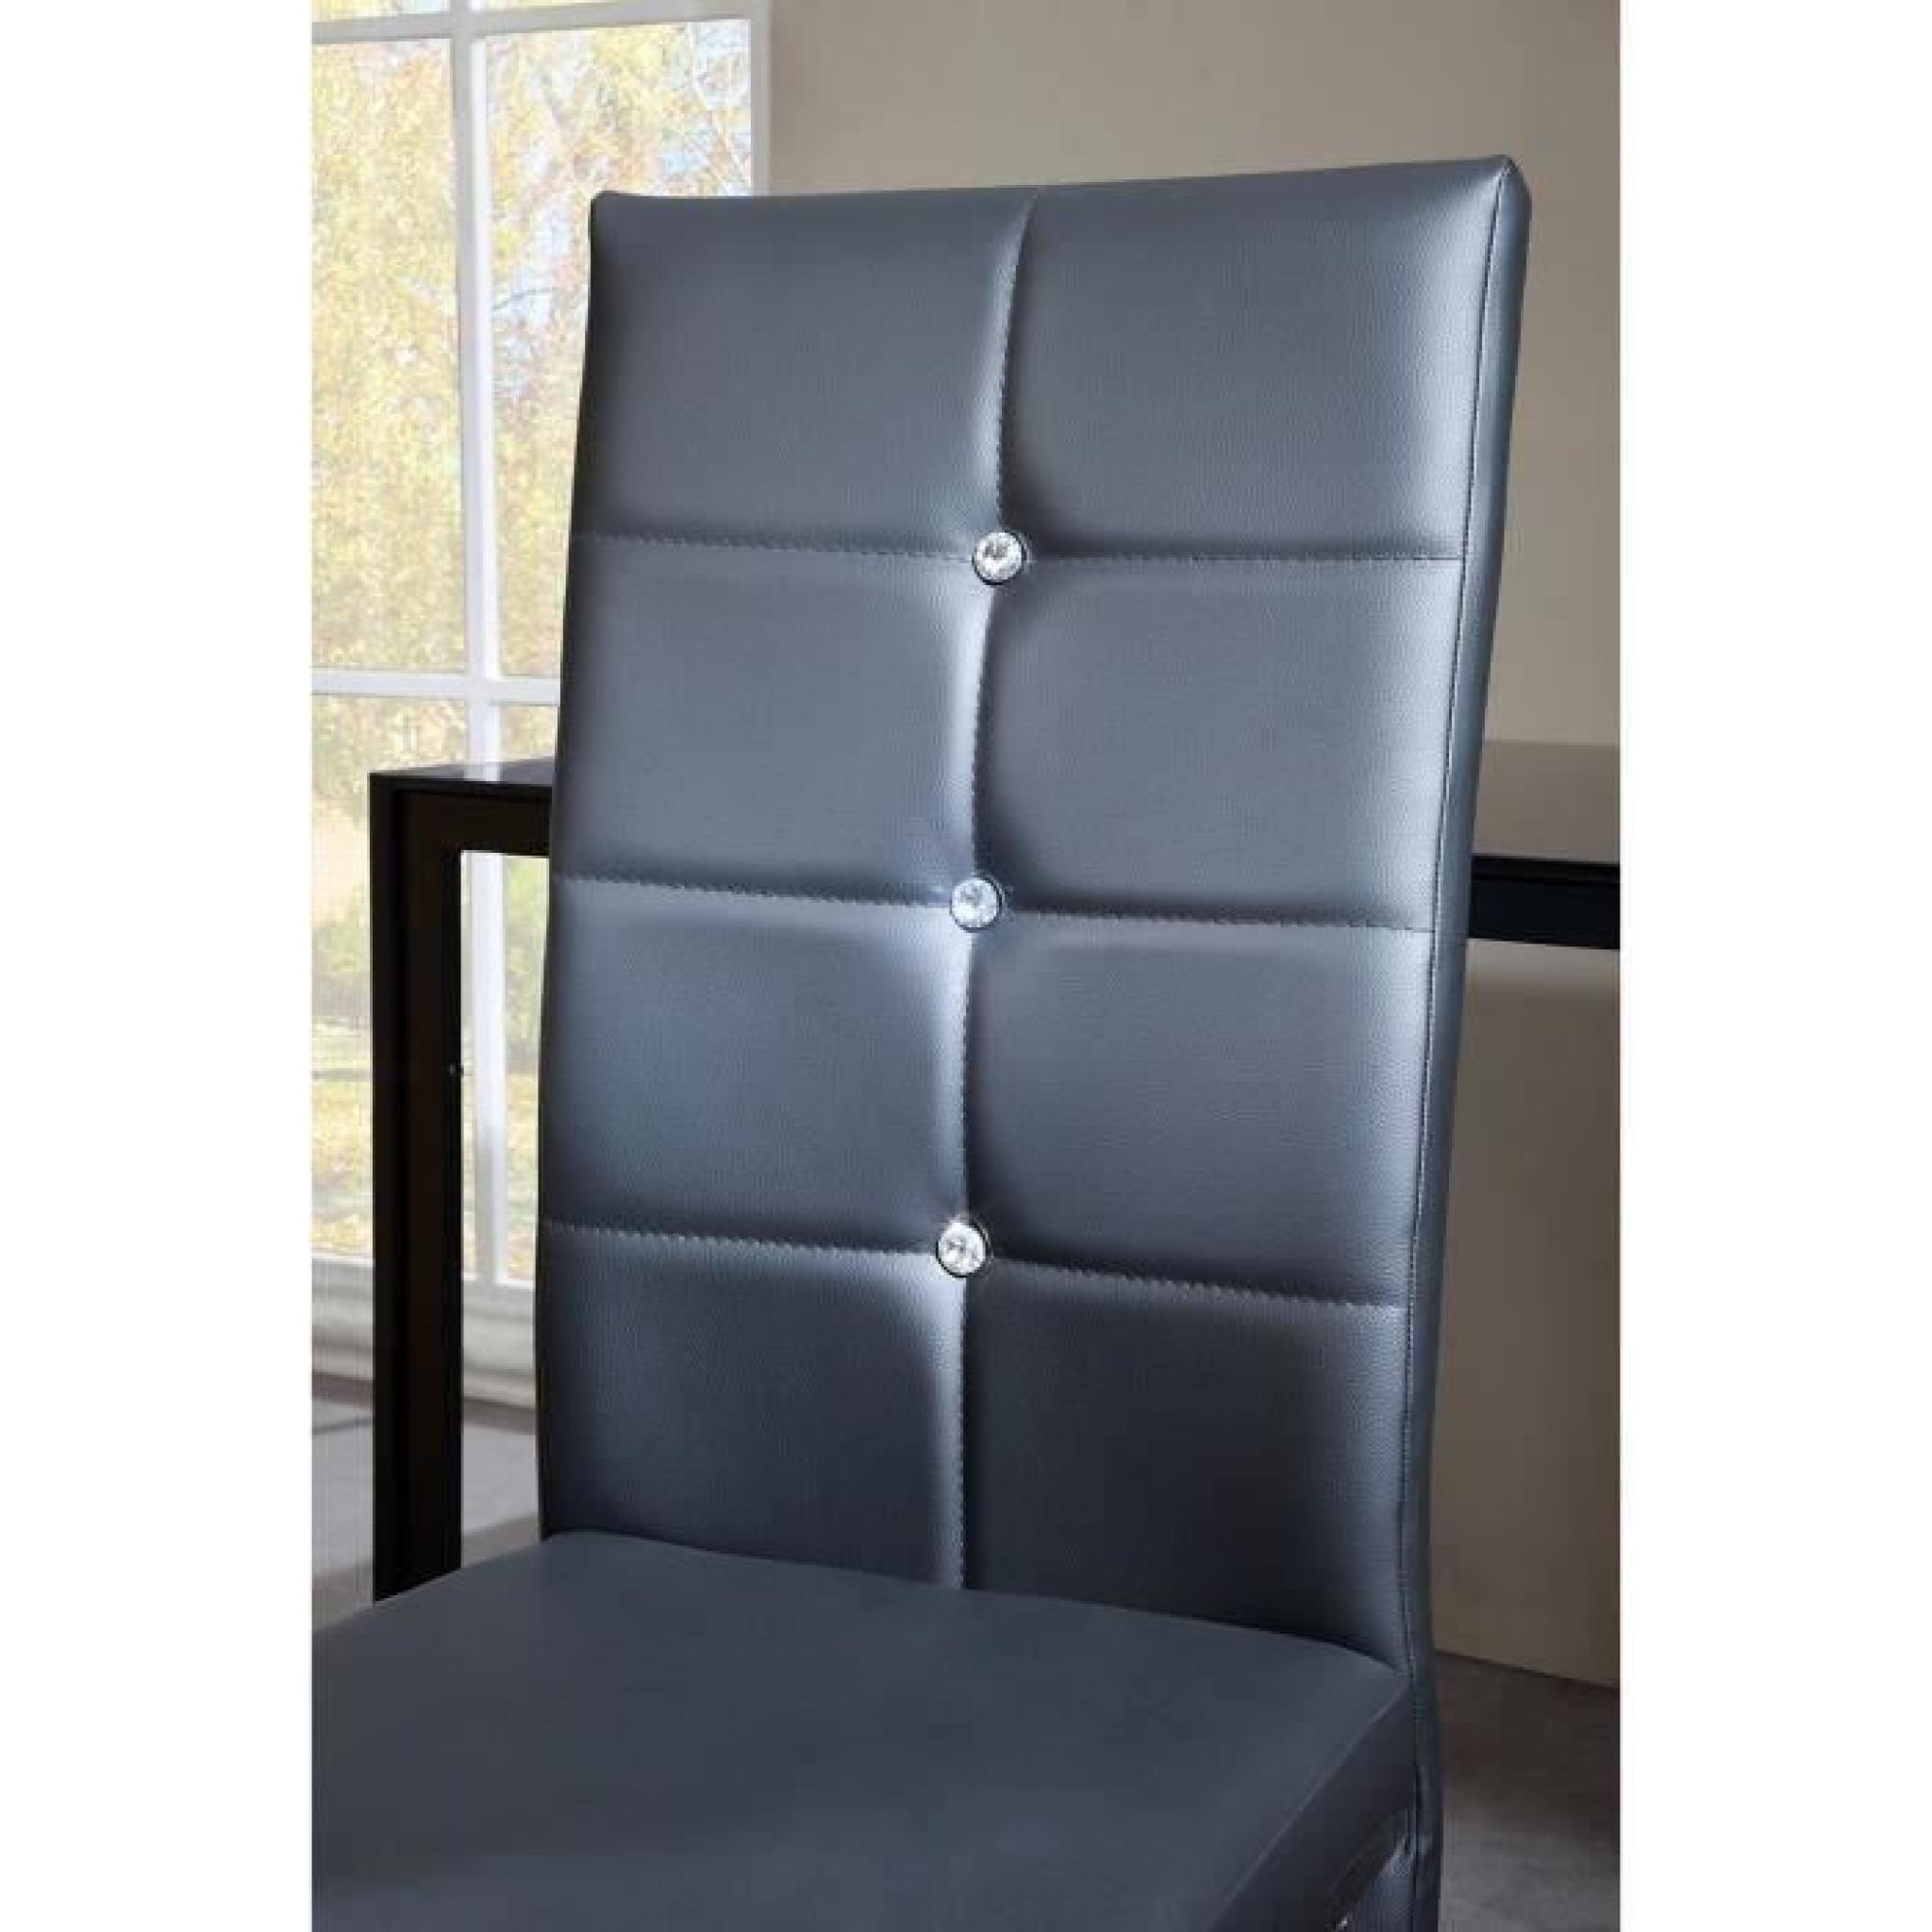 Bling lot de 2 chaises de salle manger strass noires for Lot de 8 chaise de salle a manger